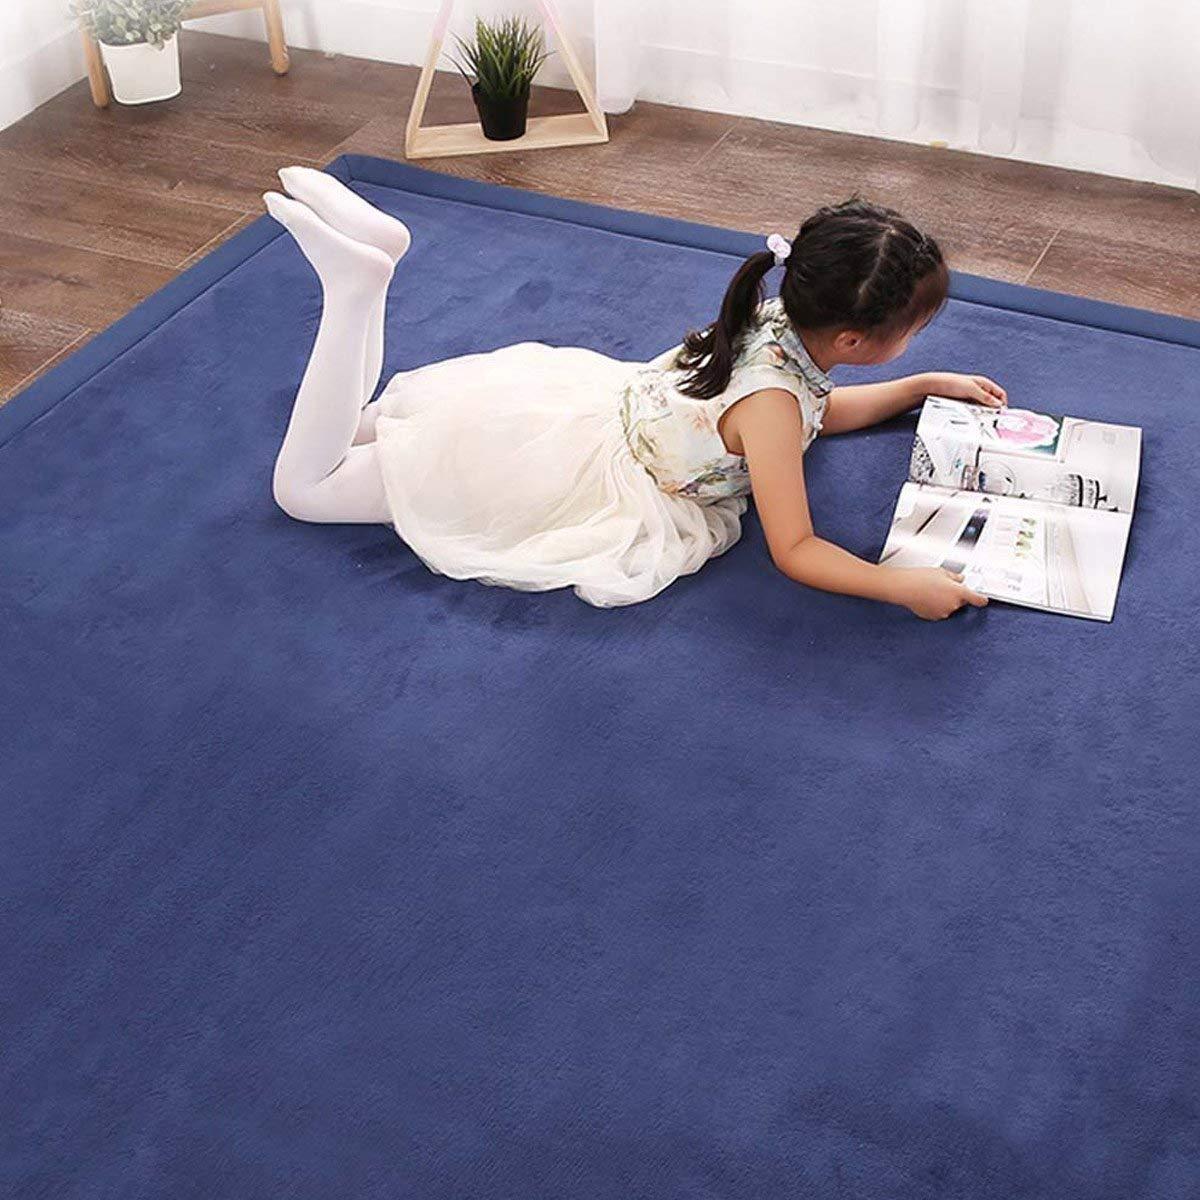 Coral Velvet Carpet Mat Area Rugs Play Crawling Mat for Baby Toddler Children Play Mat Yoga Mat Exercise Pads